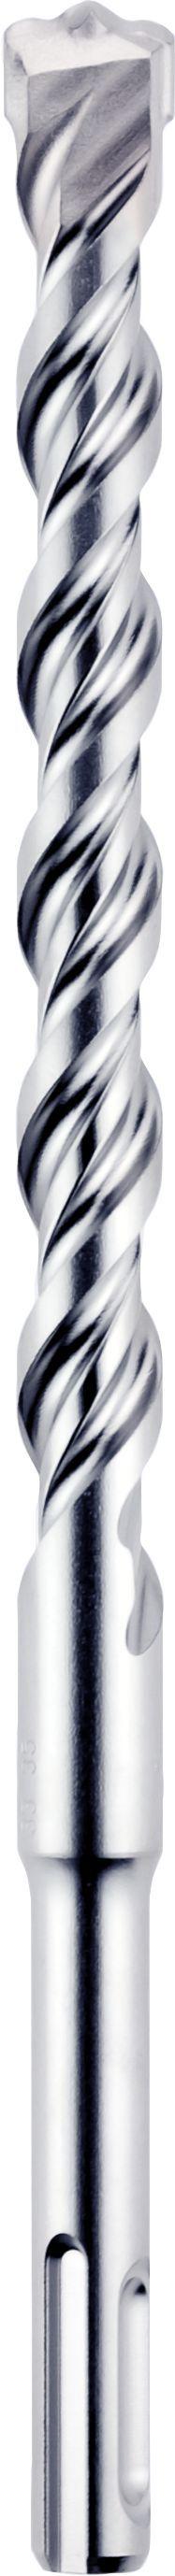 Slika BORER Rocket 3 SDS-plus 22x450 mm